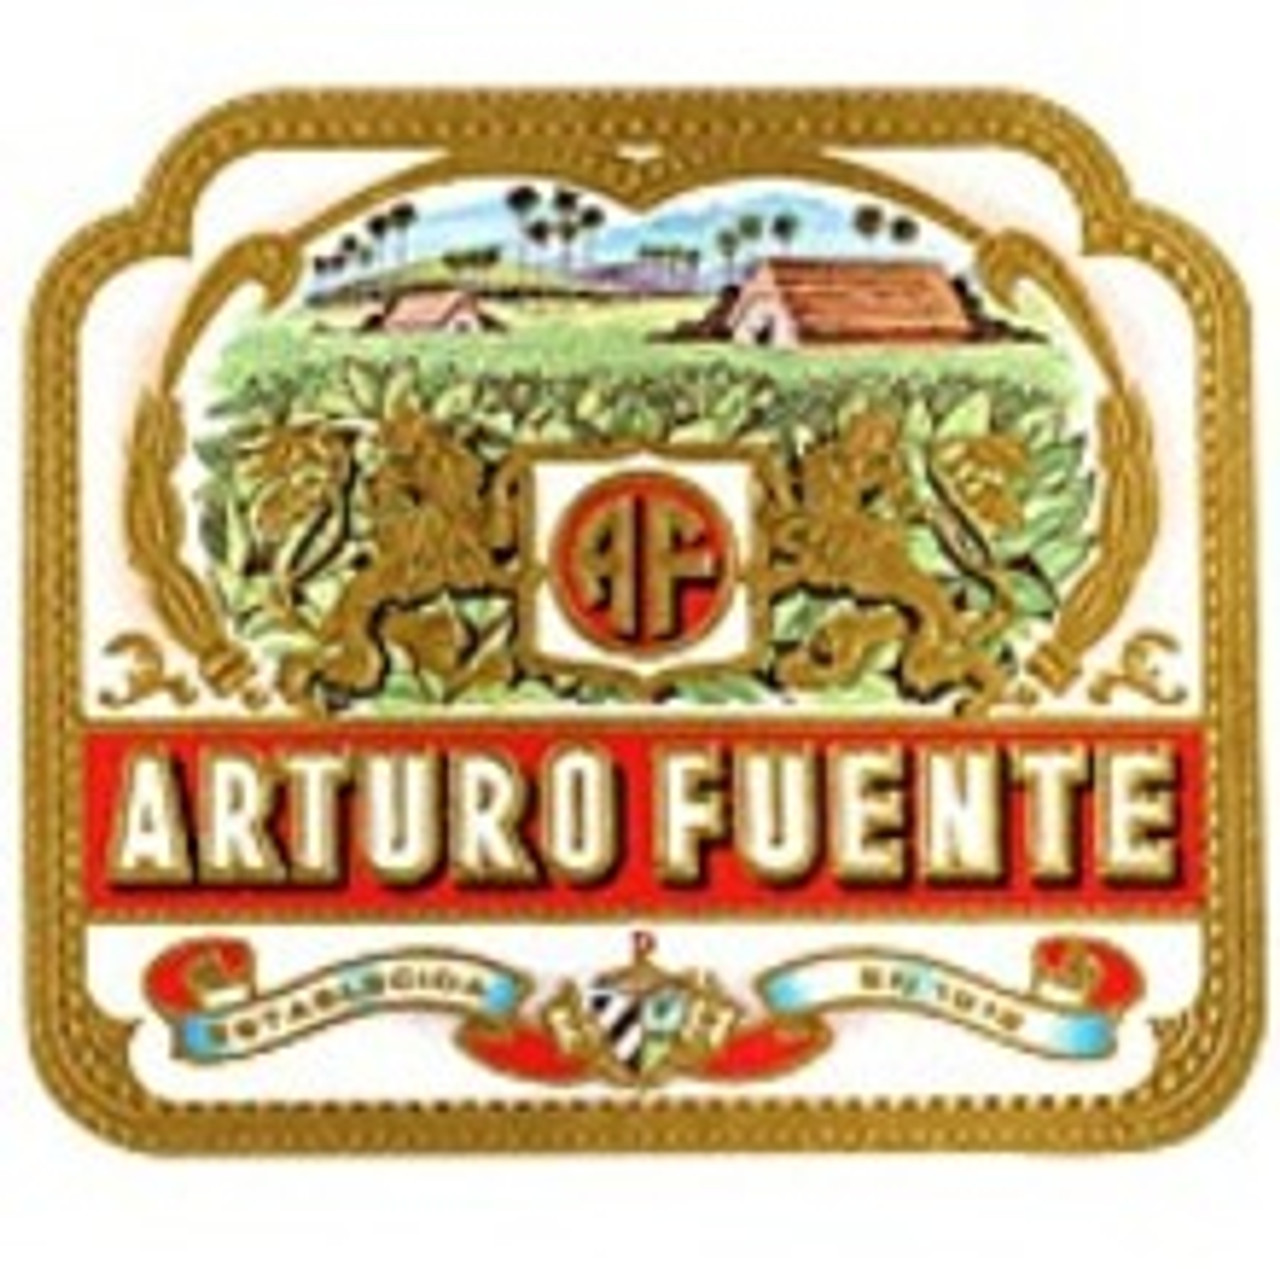 Arturo Fuente Don Carlos President Cigars - 6 1/2 x 50 (Box of 25)